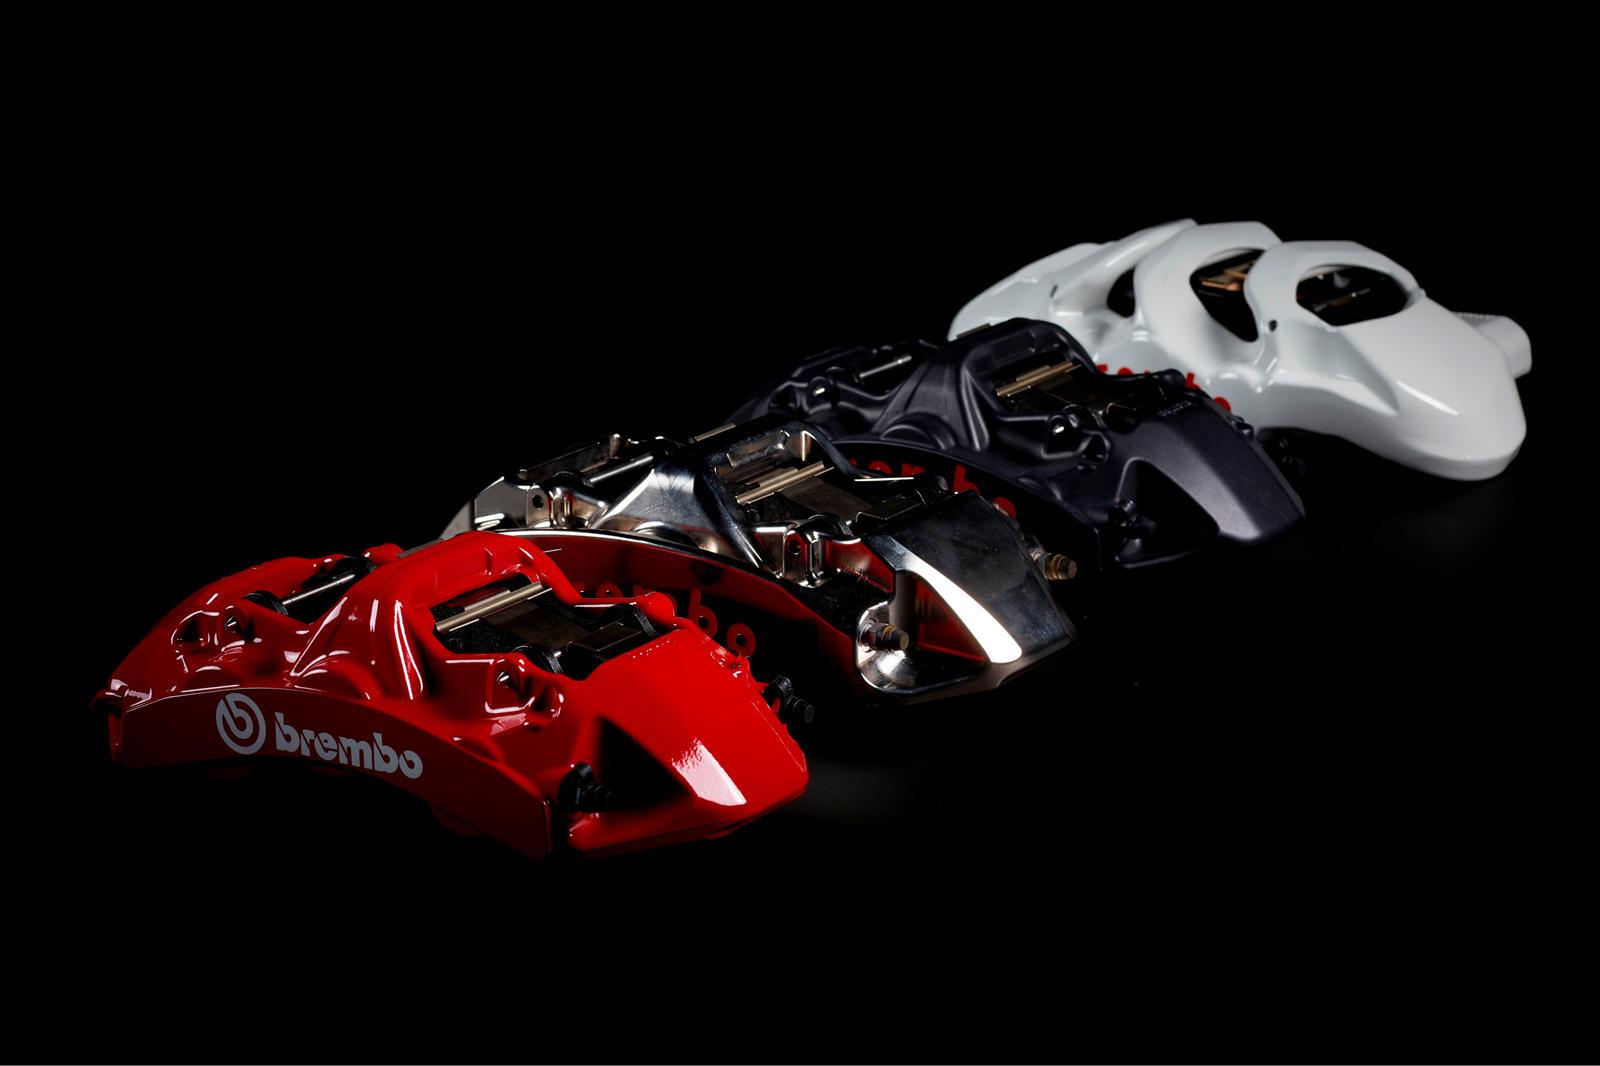 95111 Brembo Releases Aftermarket Brake Upgrades For Your Car